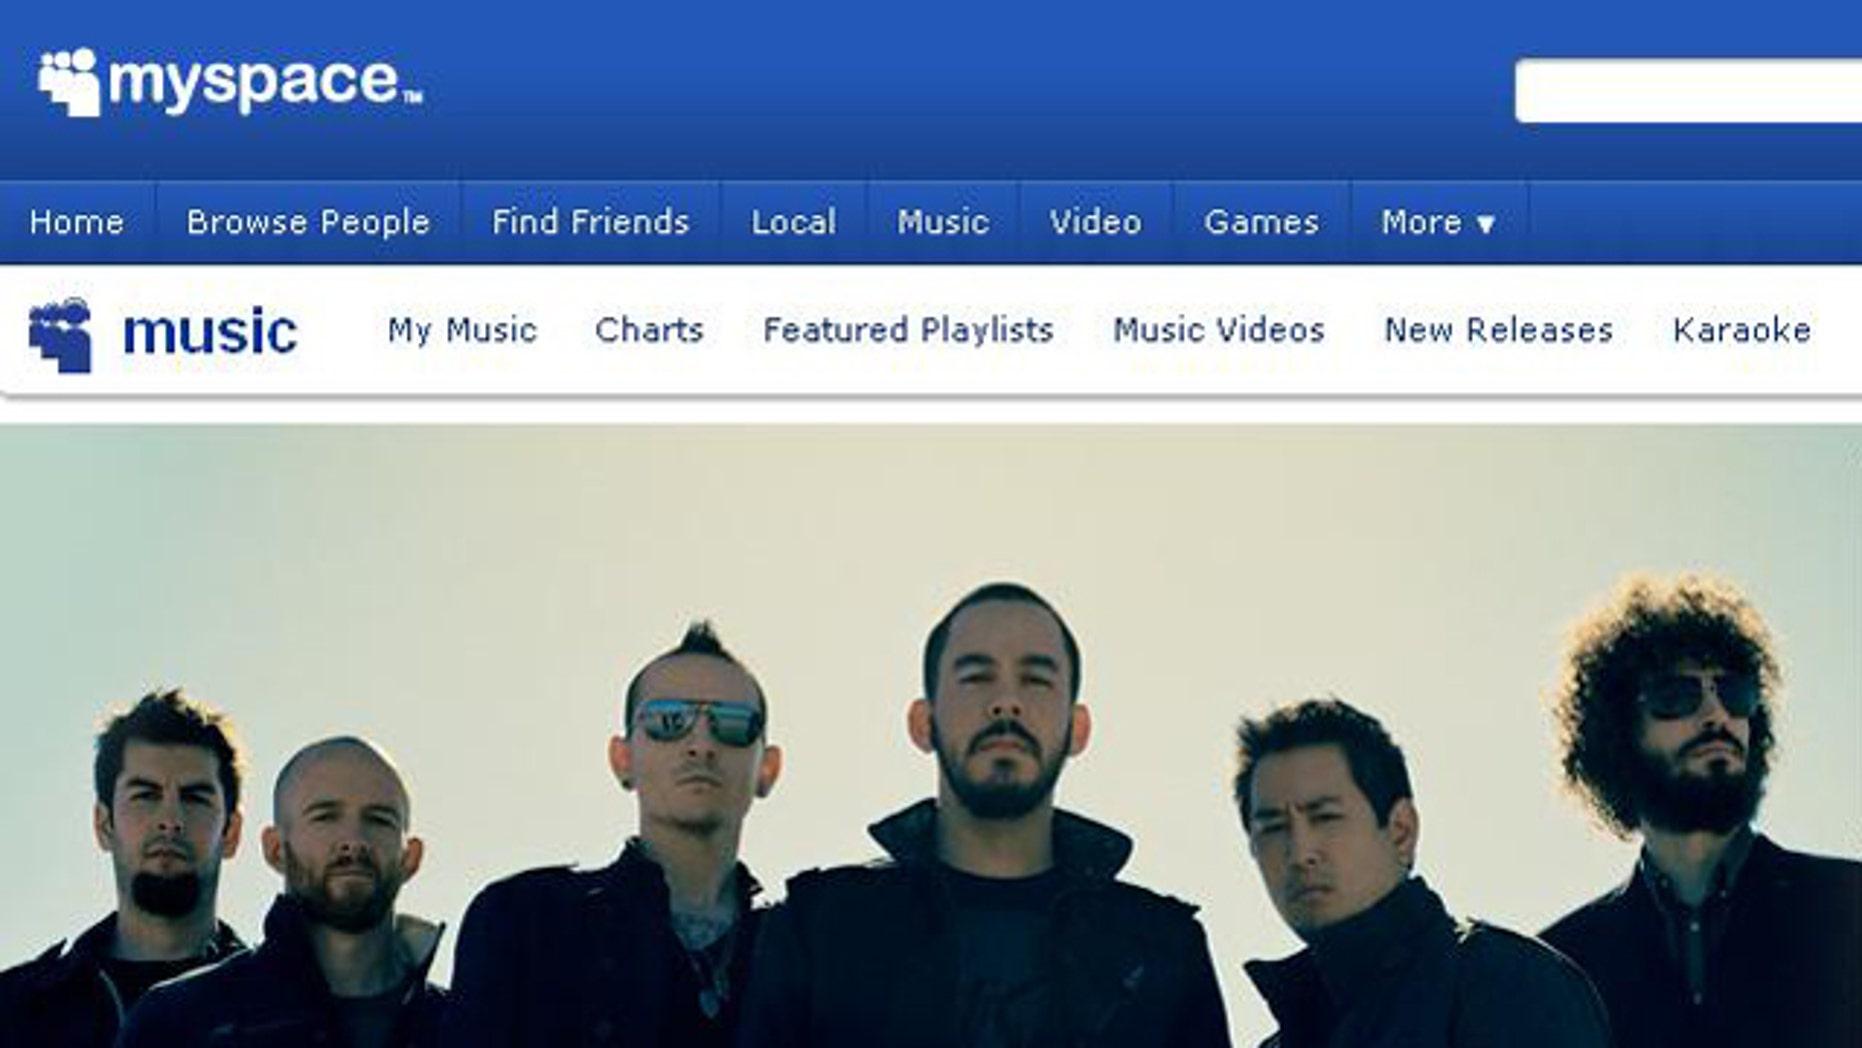 A screen capture of the MySpace Web site.